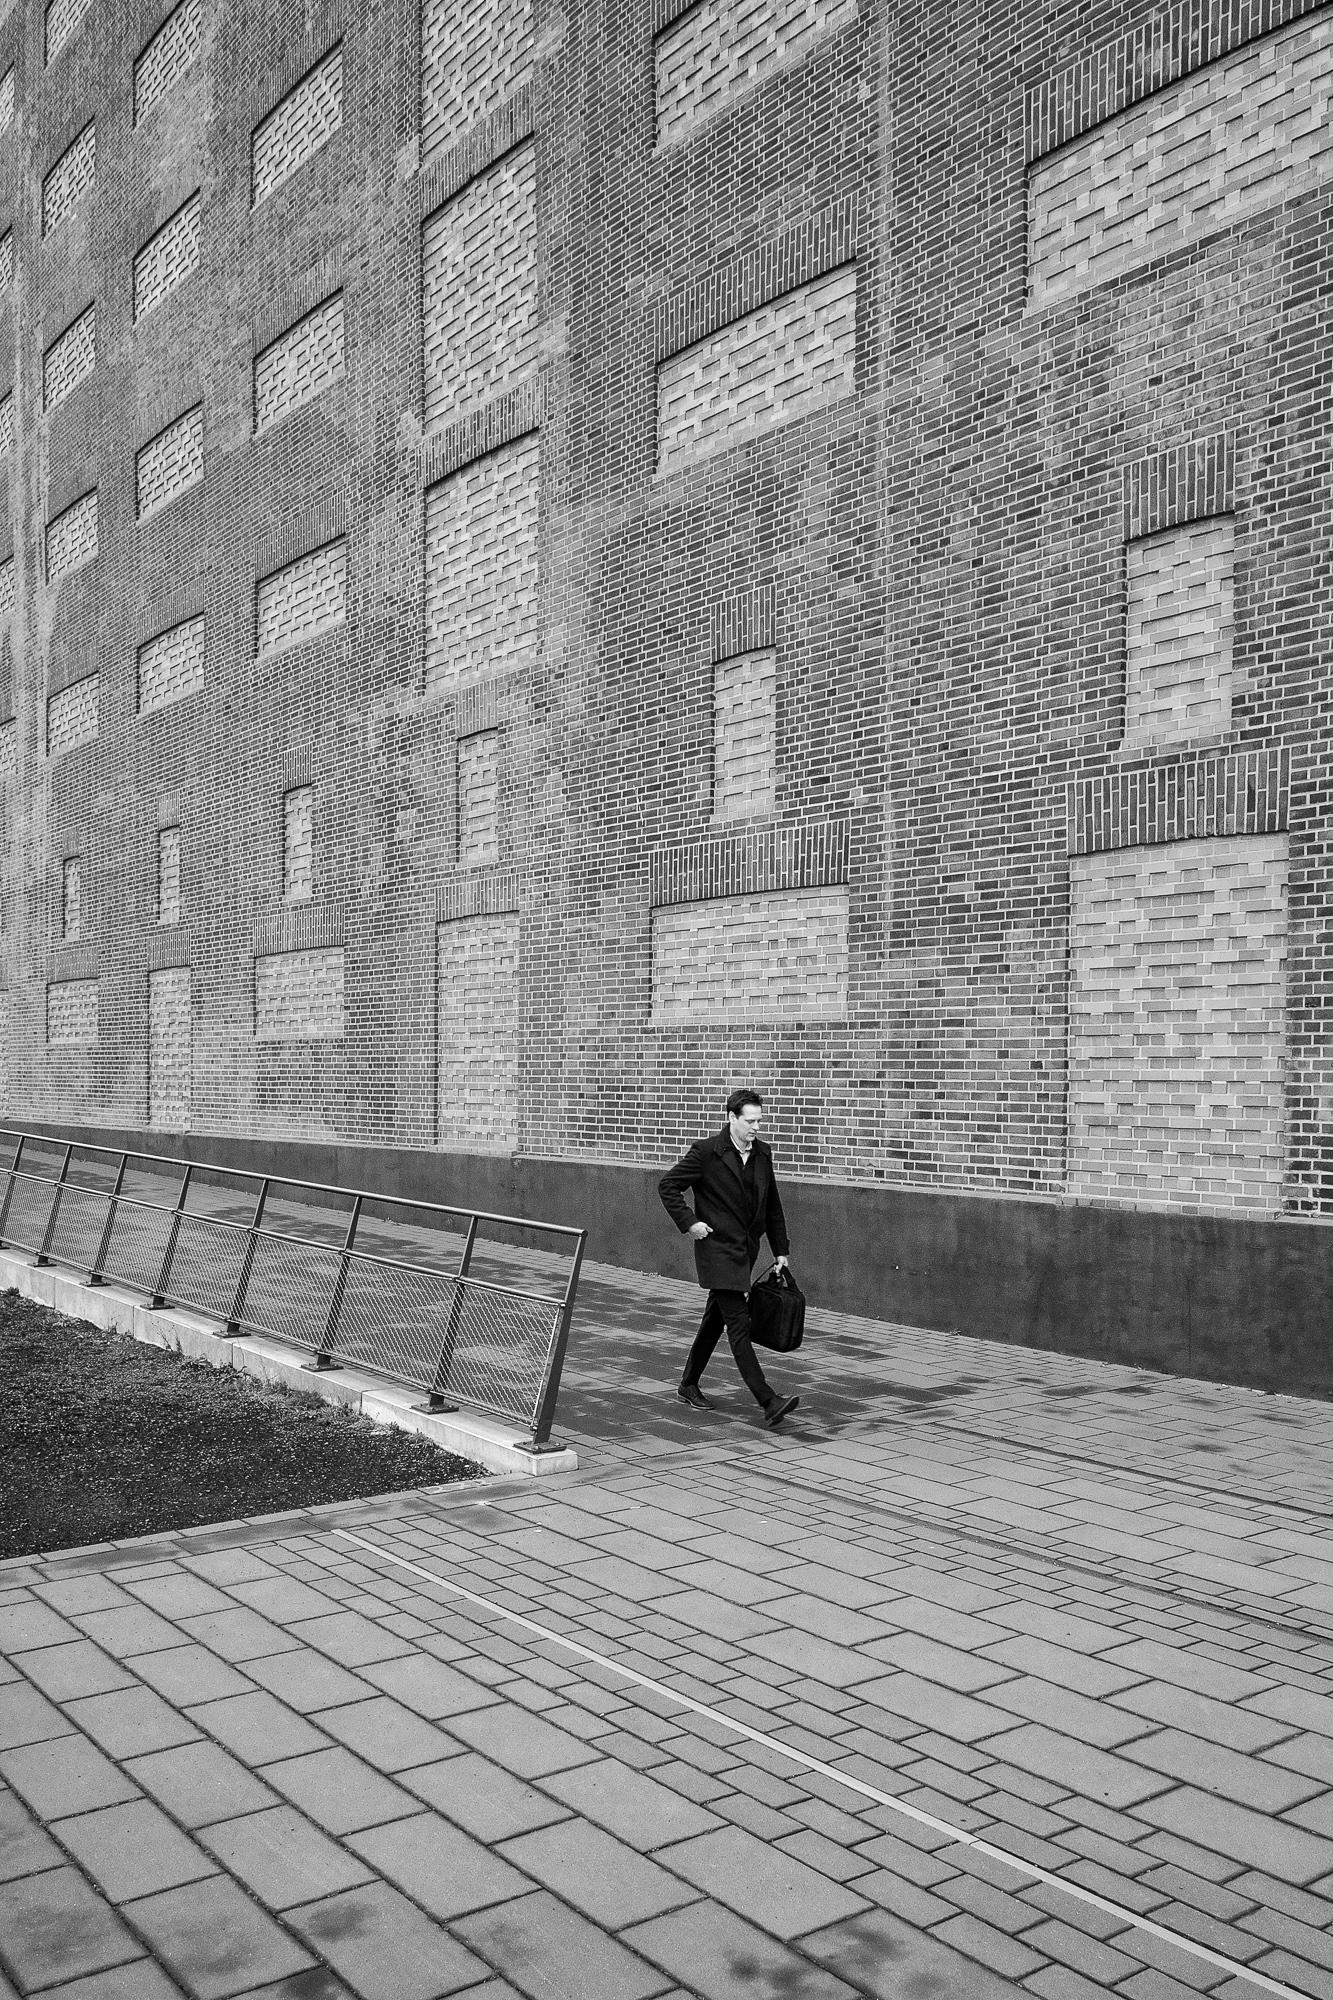 querformat-fotografie - Achim Katzberg - [untitled - Duisburg / März 2018]